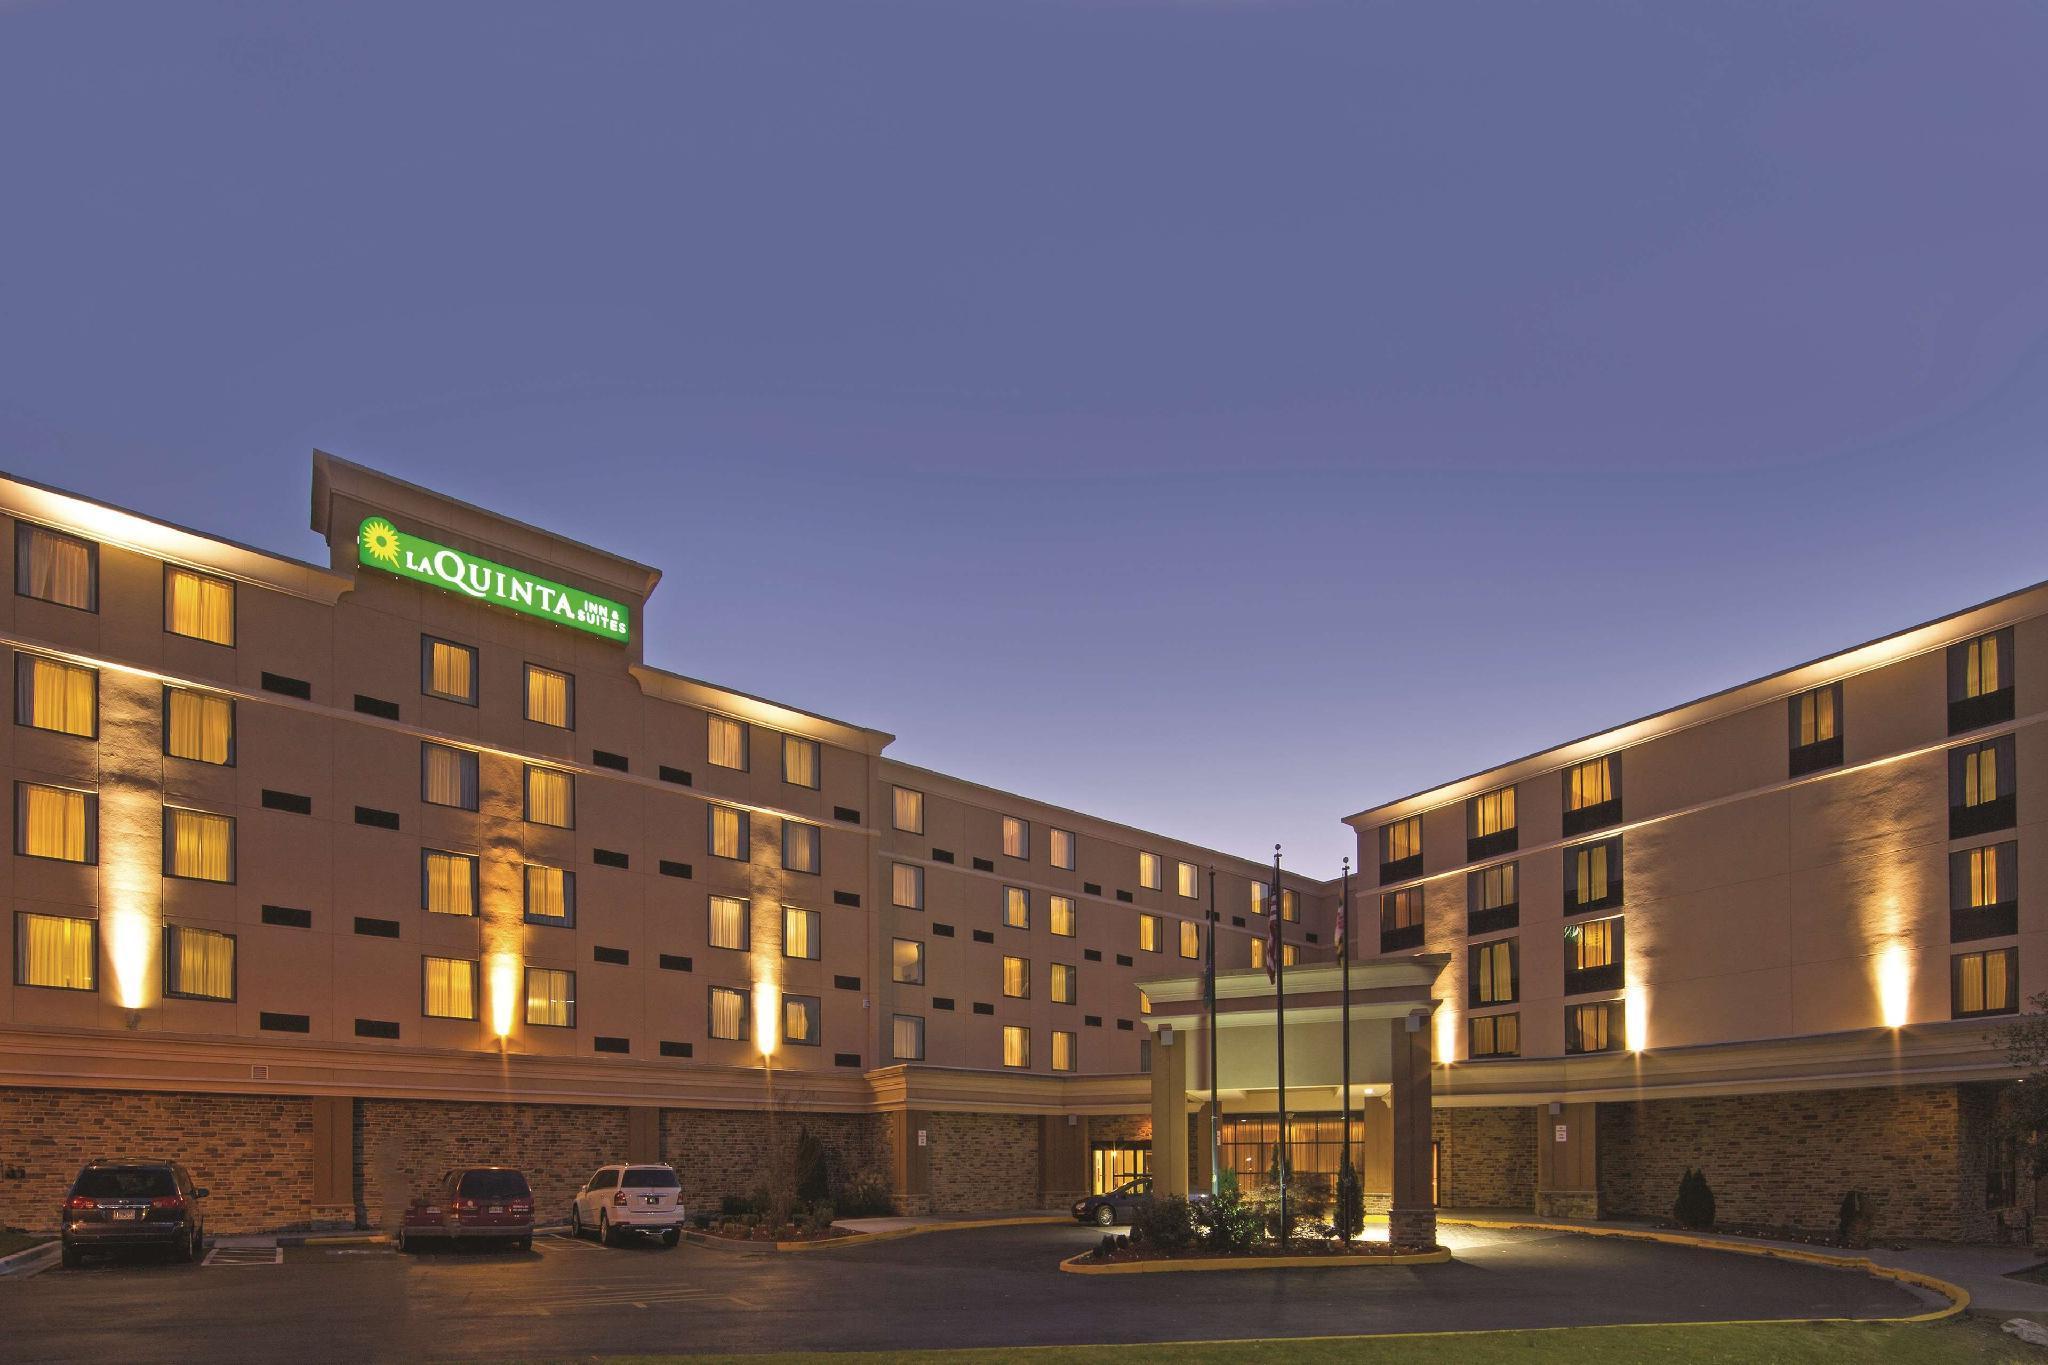 La Quinta Inn And Suites By Wyndham Salisbury